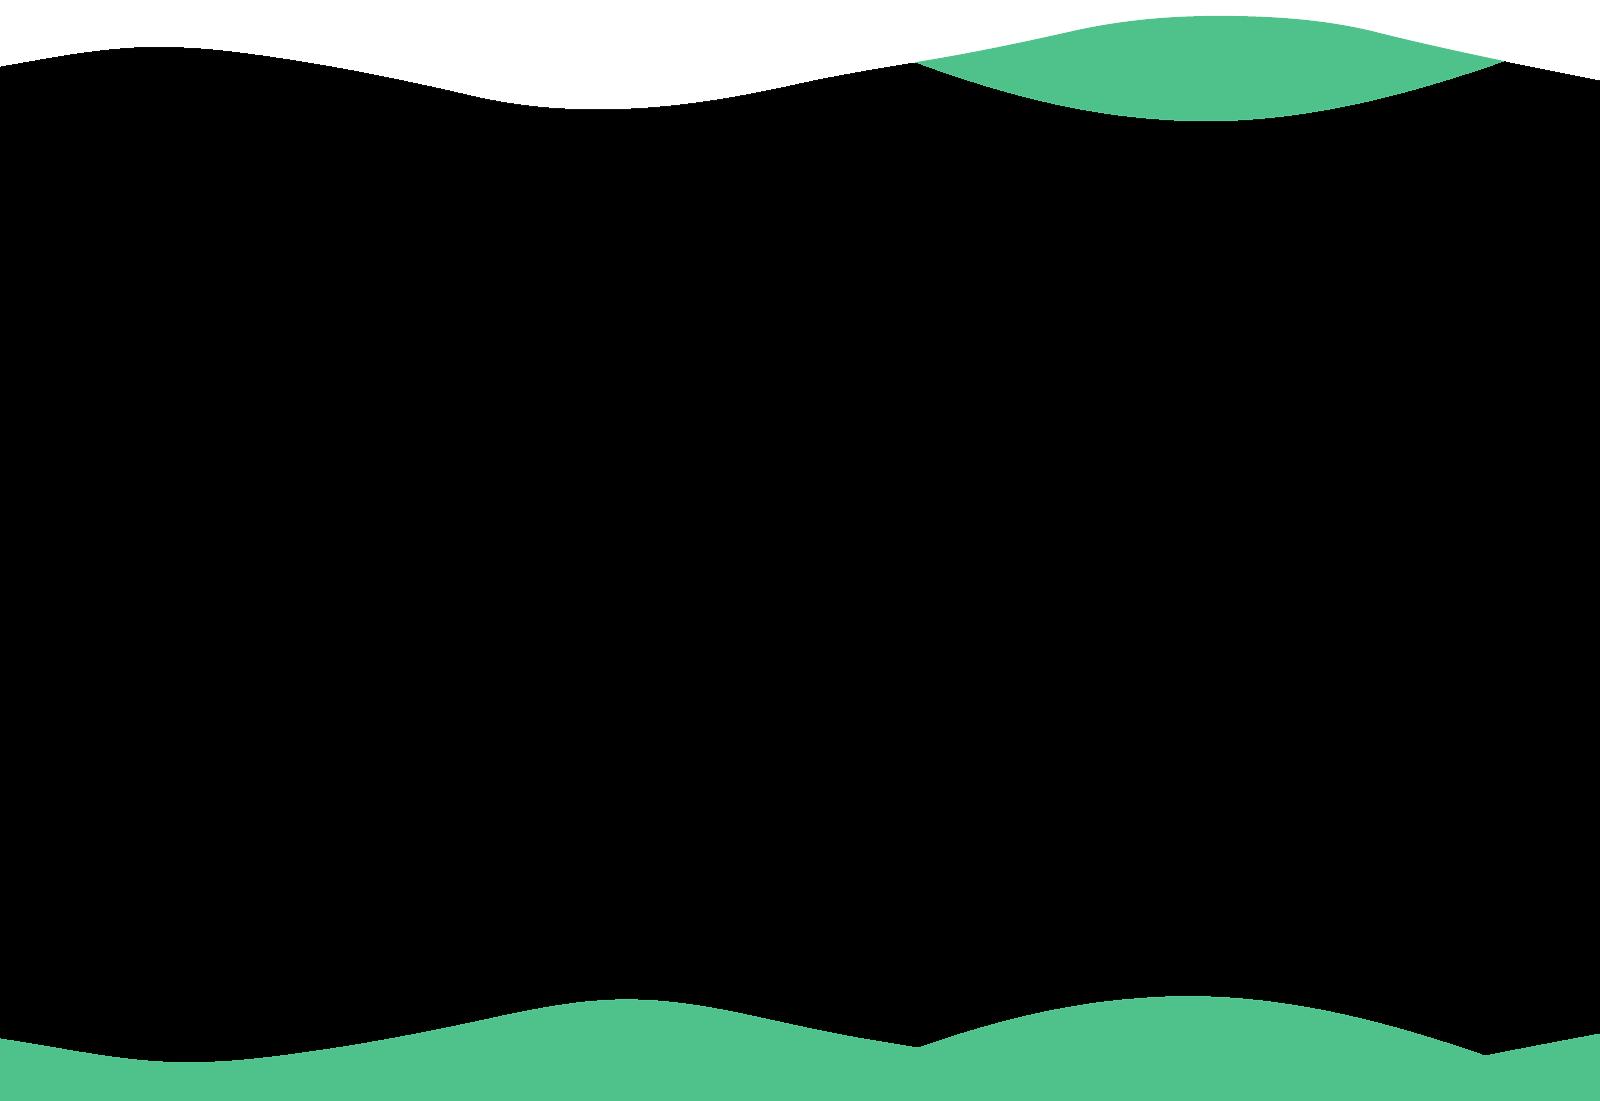 curves-green-white